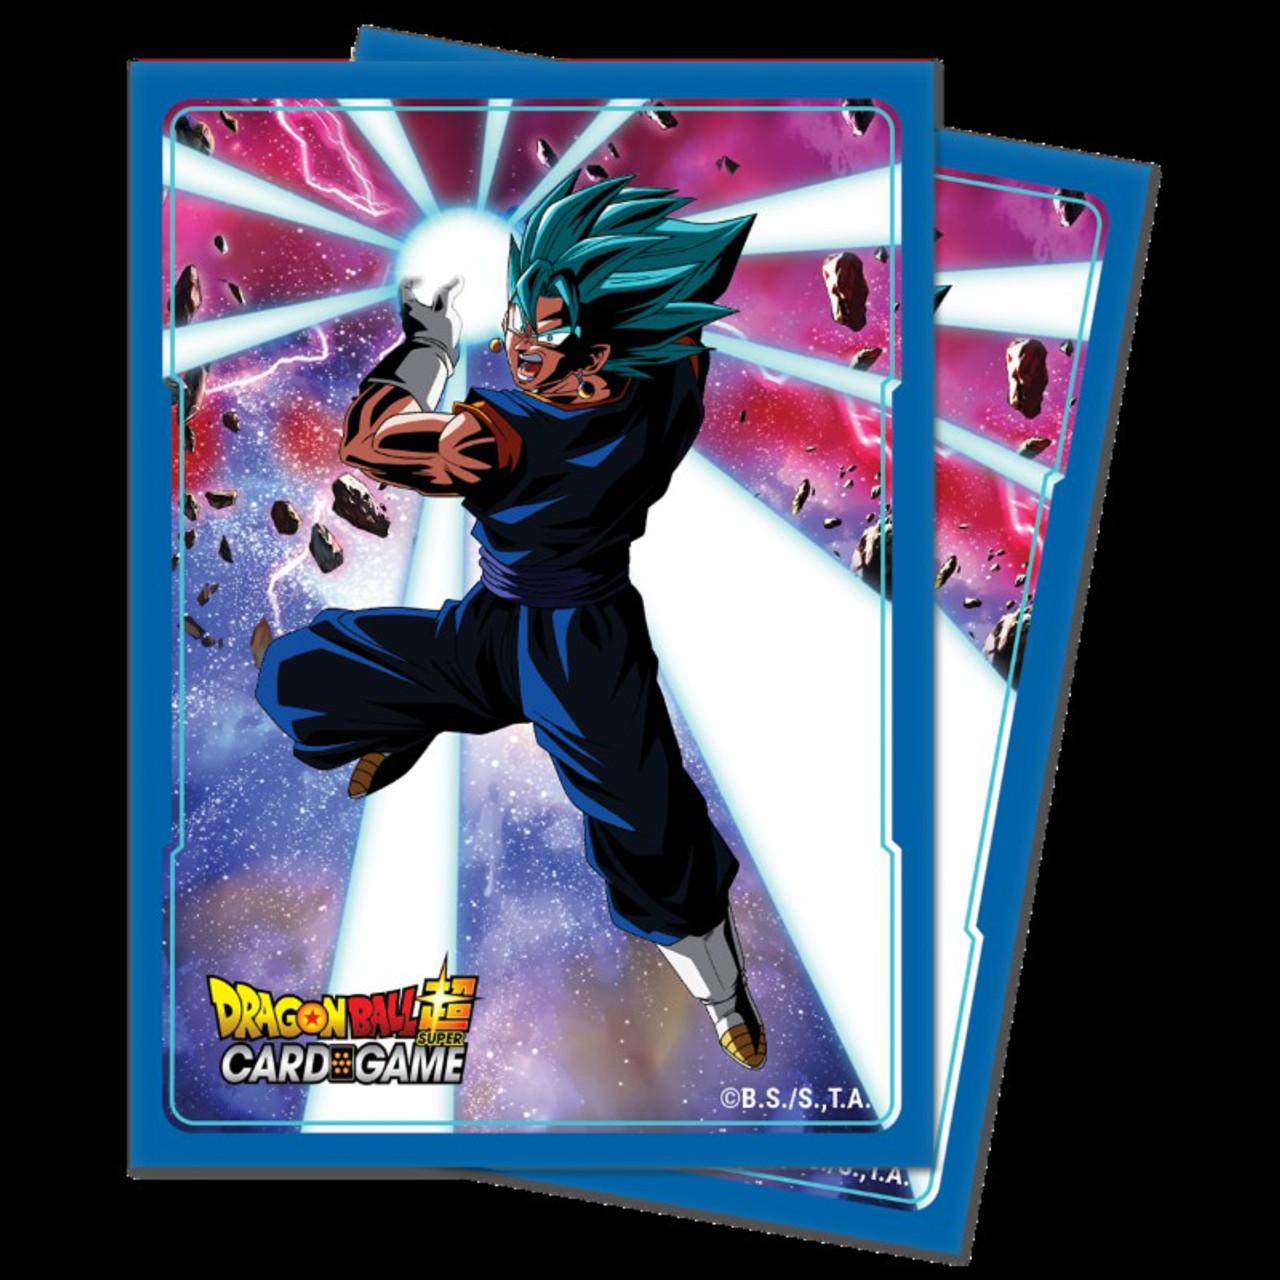 Set 3 Ultra Pro Dragonball Super Set Card Game Deck Protector Sleeves